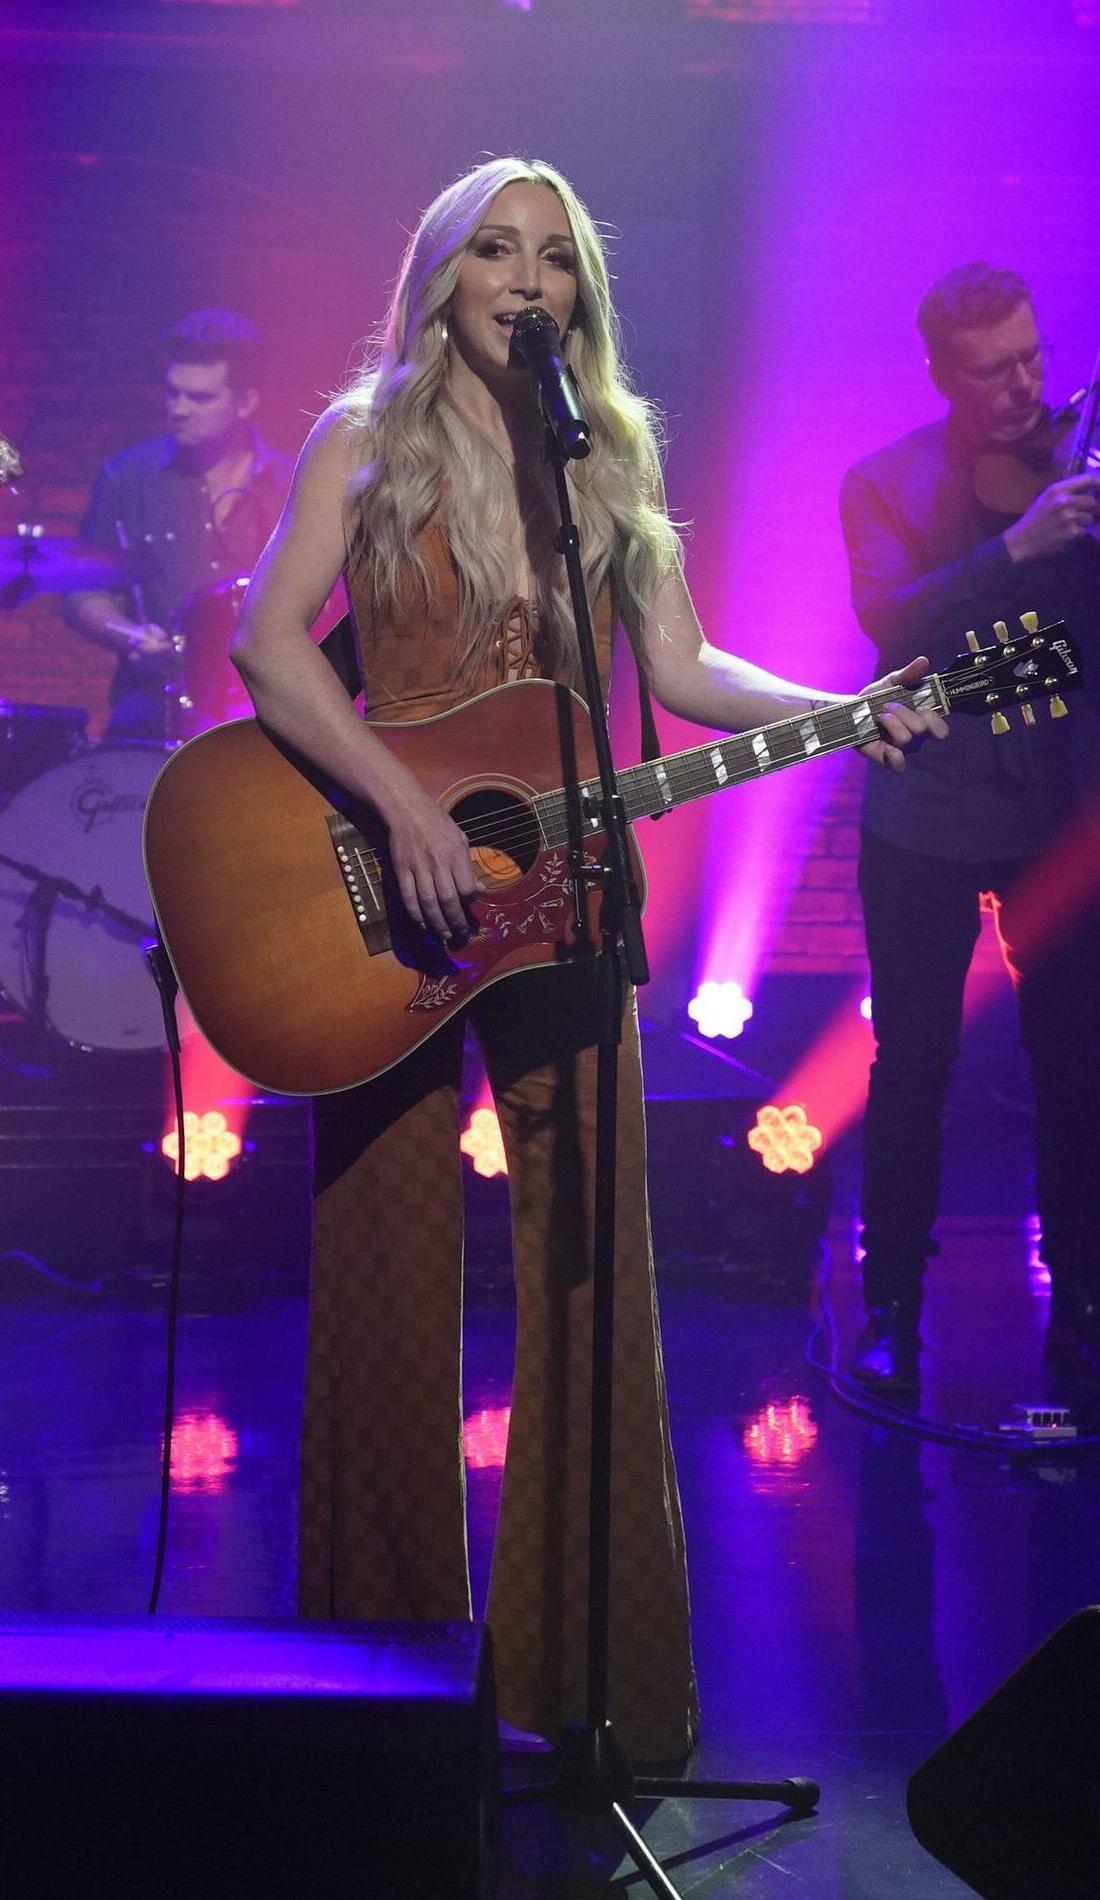 A Ashley Monroe live event